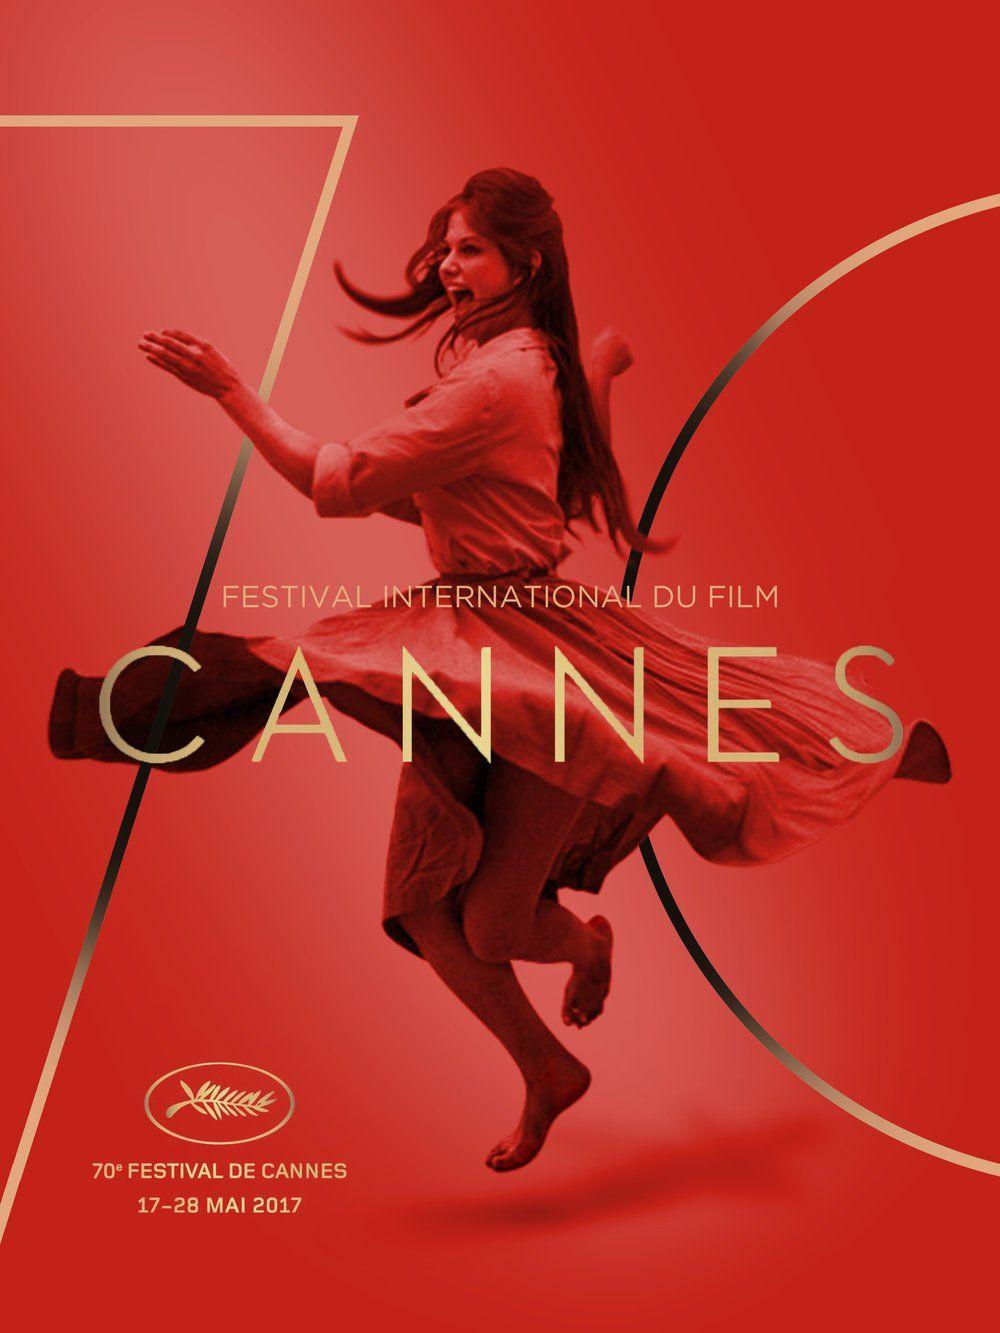 70-Cannes Film Festival Coverage